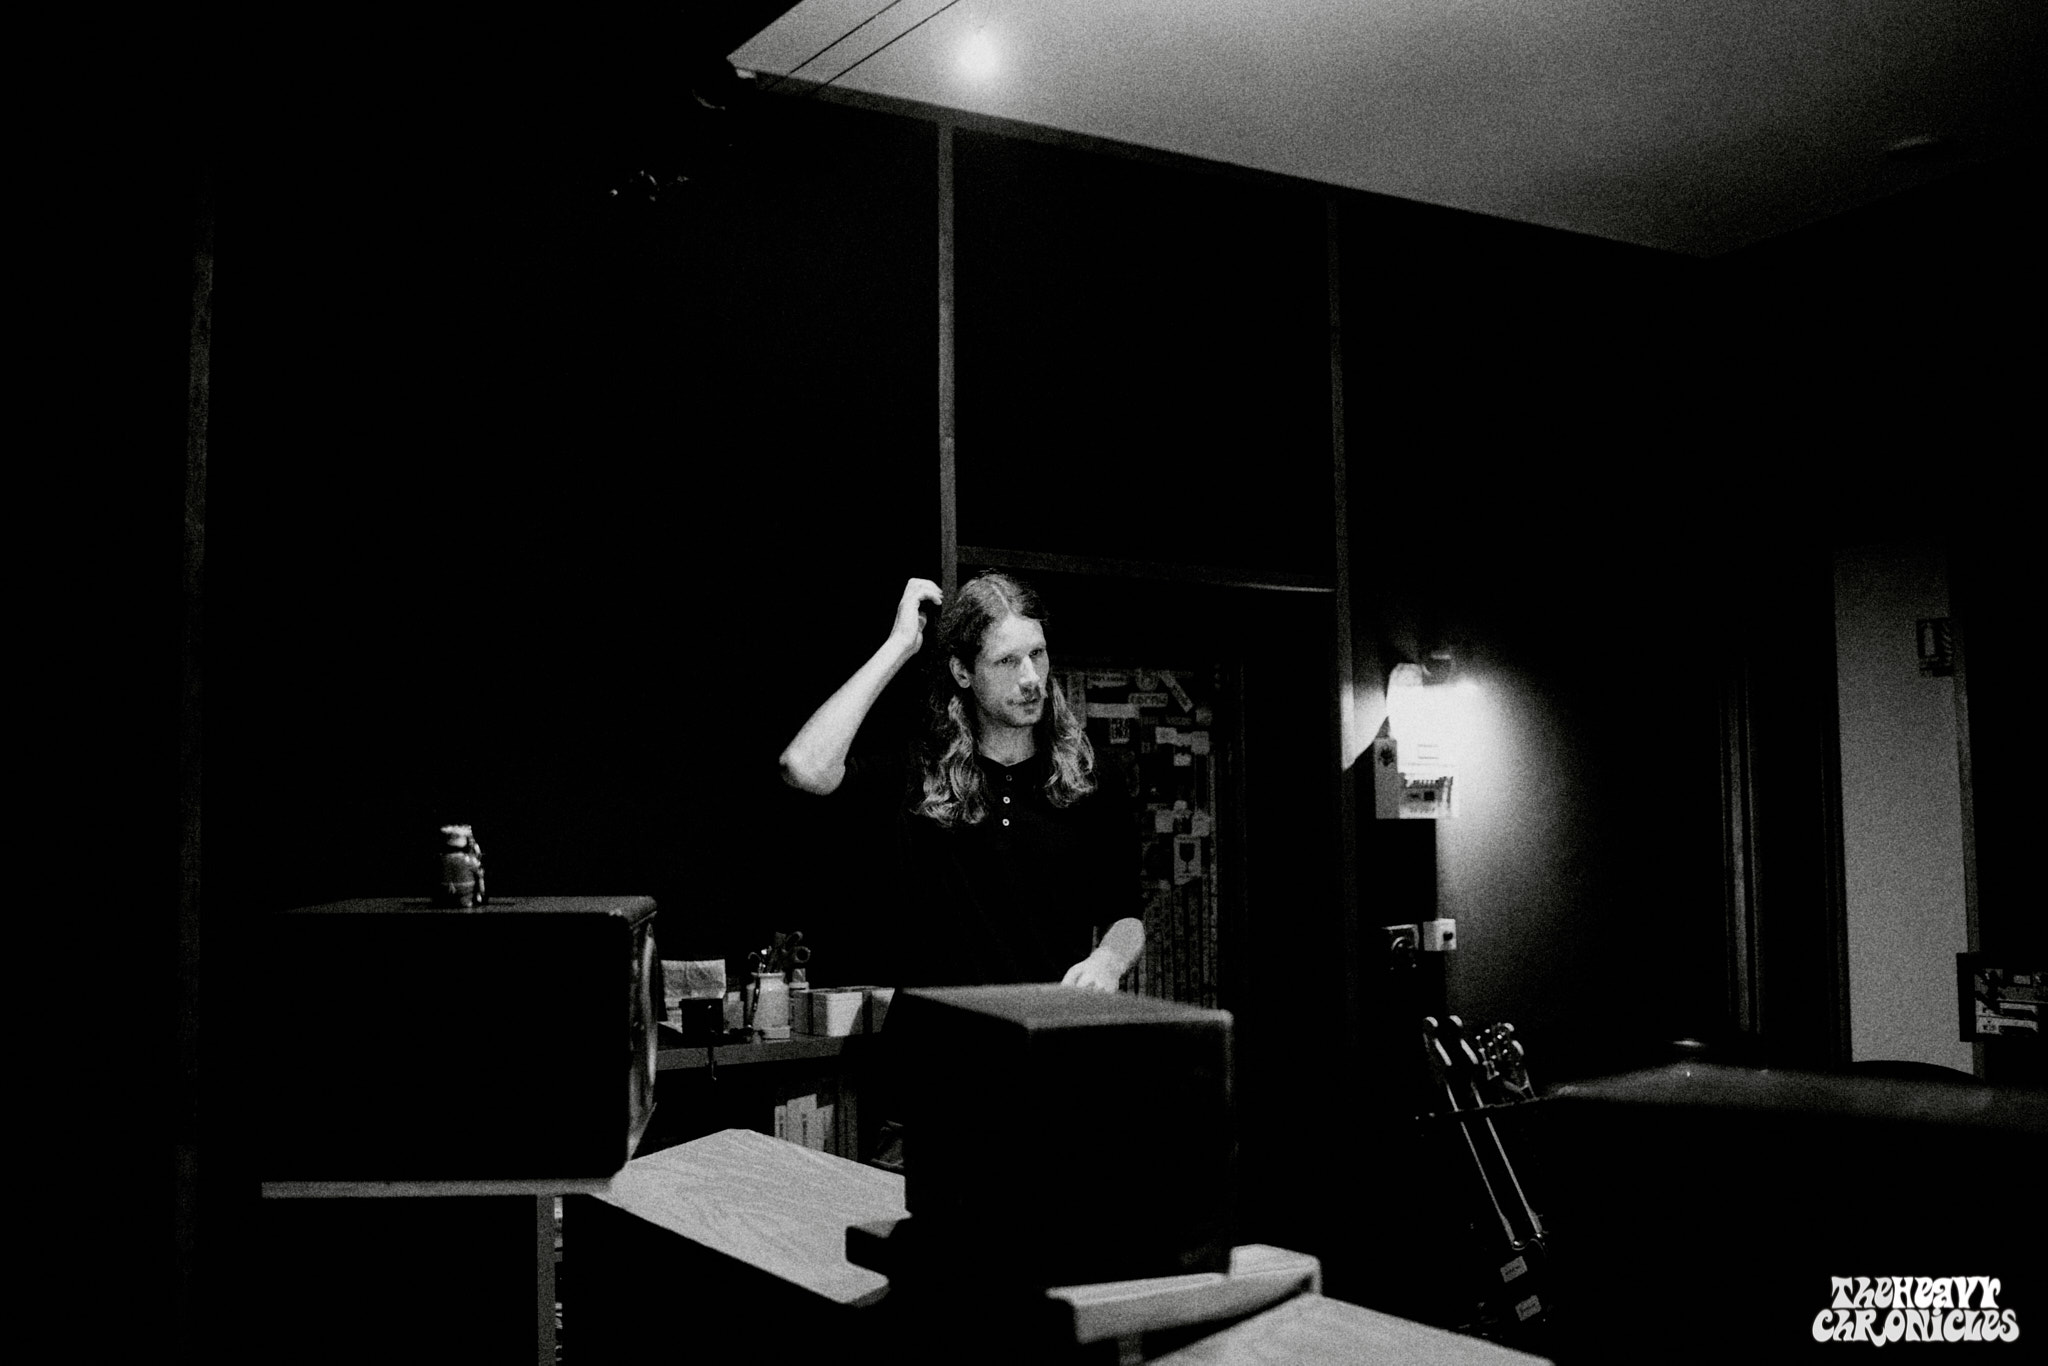 Elder-Studio-Black-Box-2019-Gael-Mathieu-The-Heavy-Chronicles-78